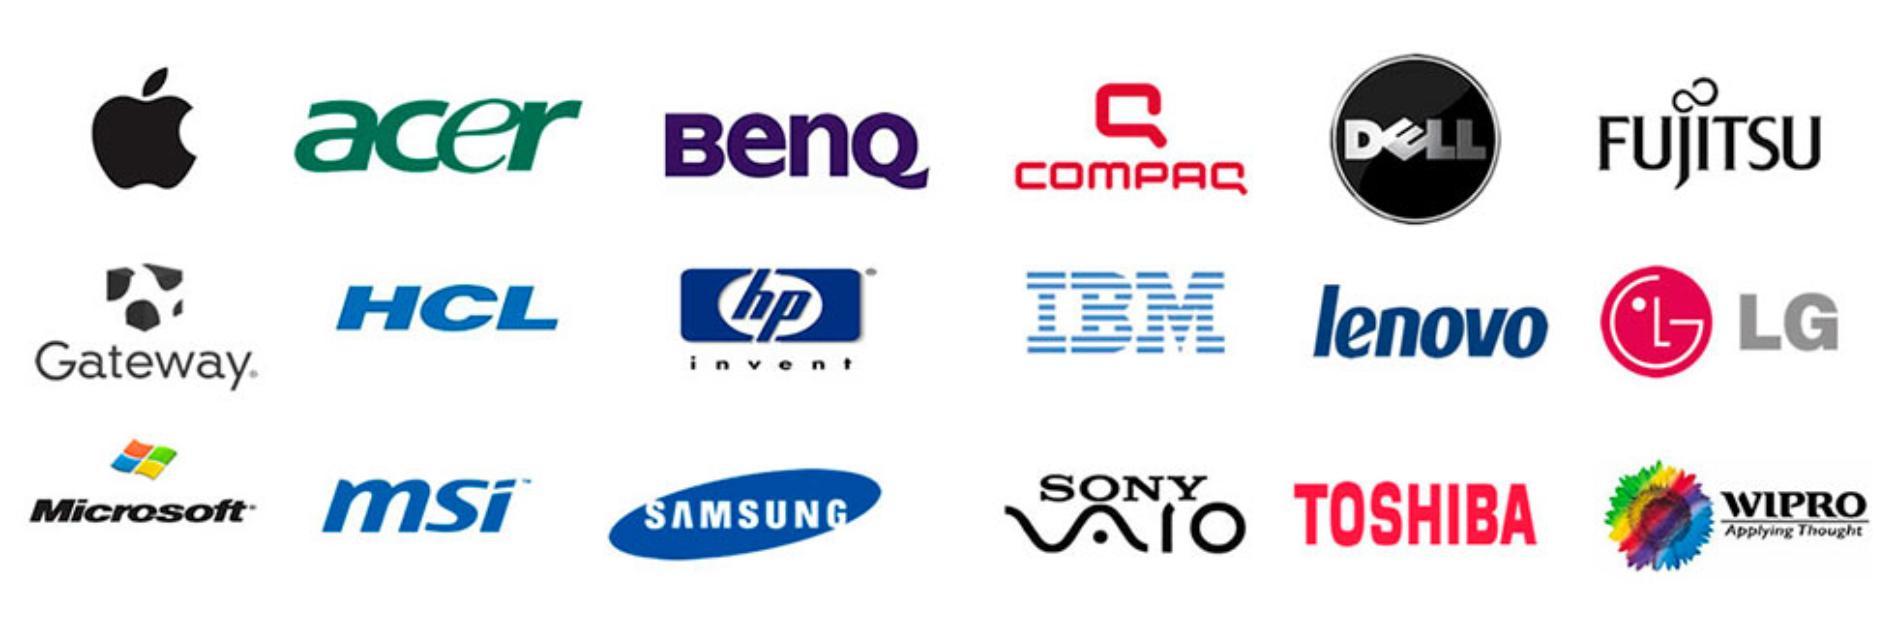 laptops marcas